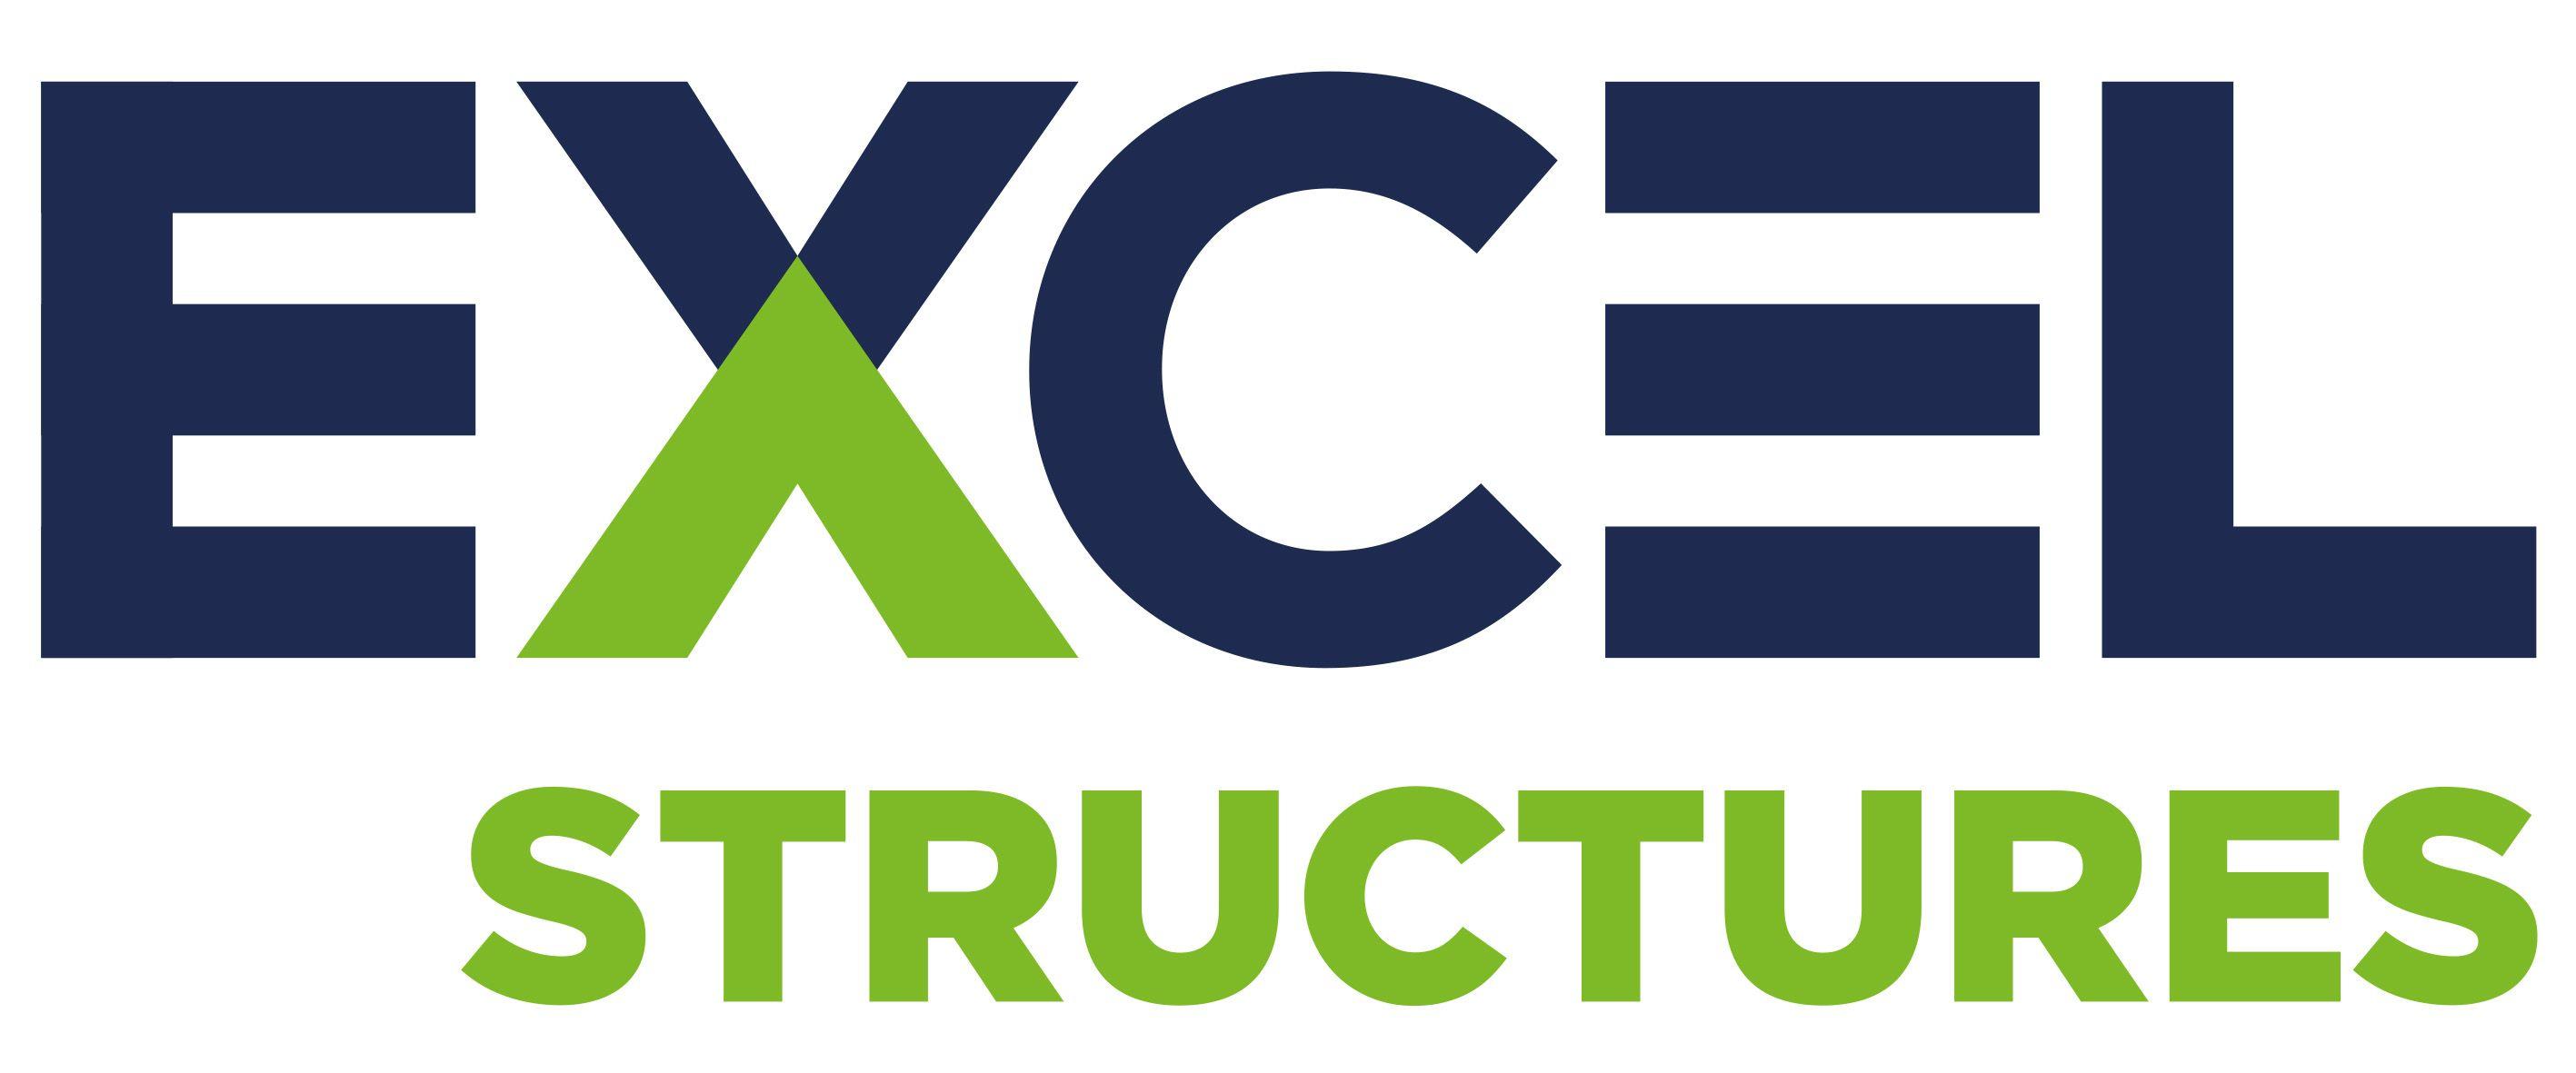 Excel Structures